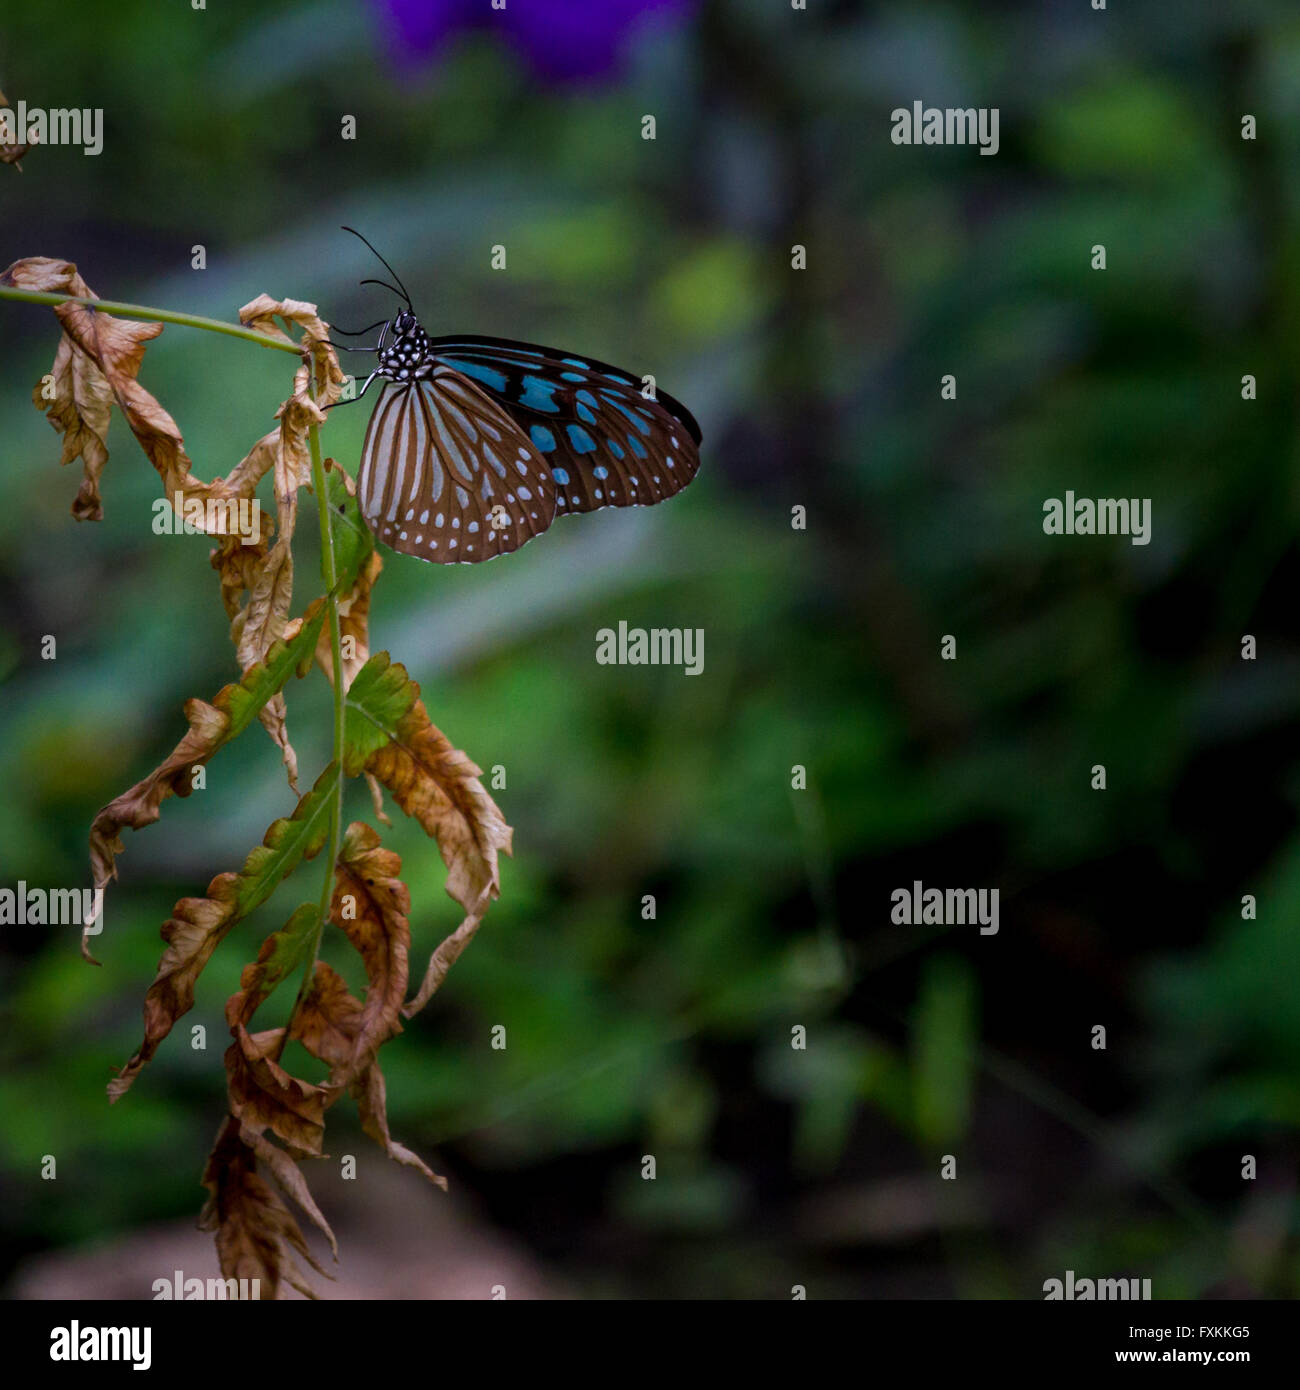 Glassy tiger butterfly, Mekong Delta, Vietnam - Stock Image